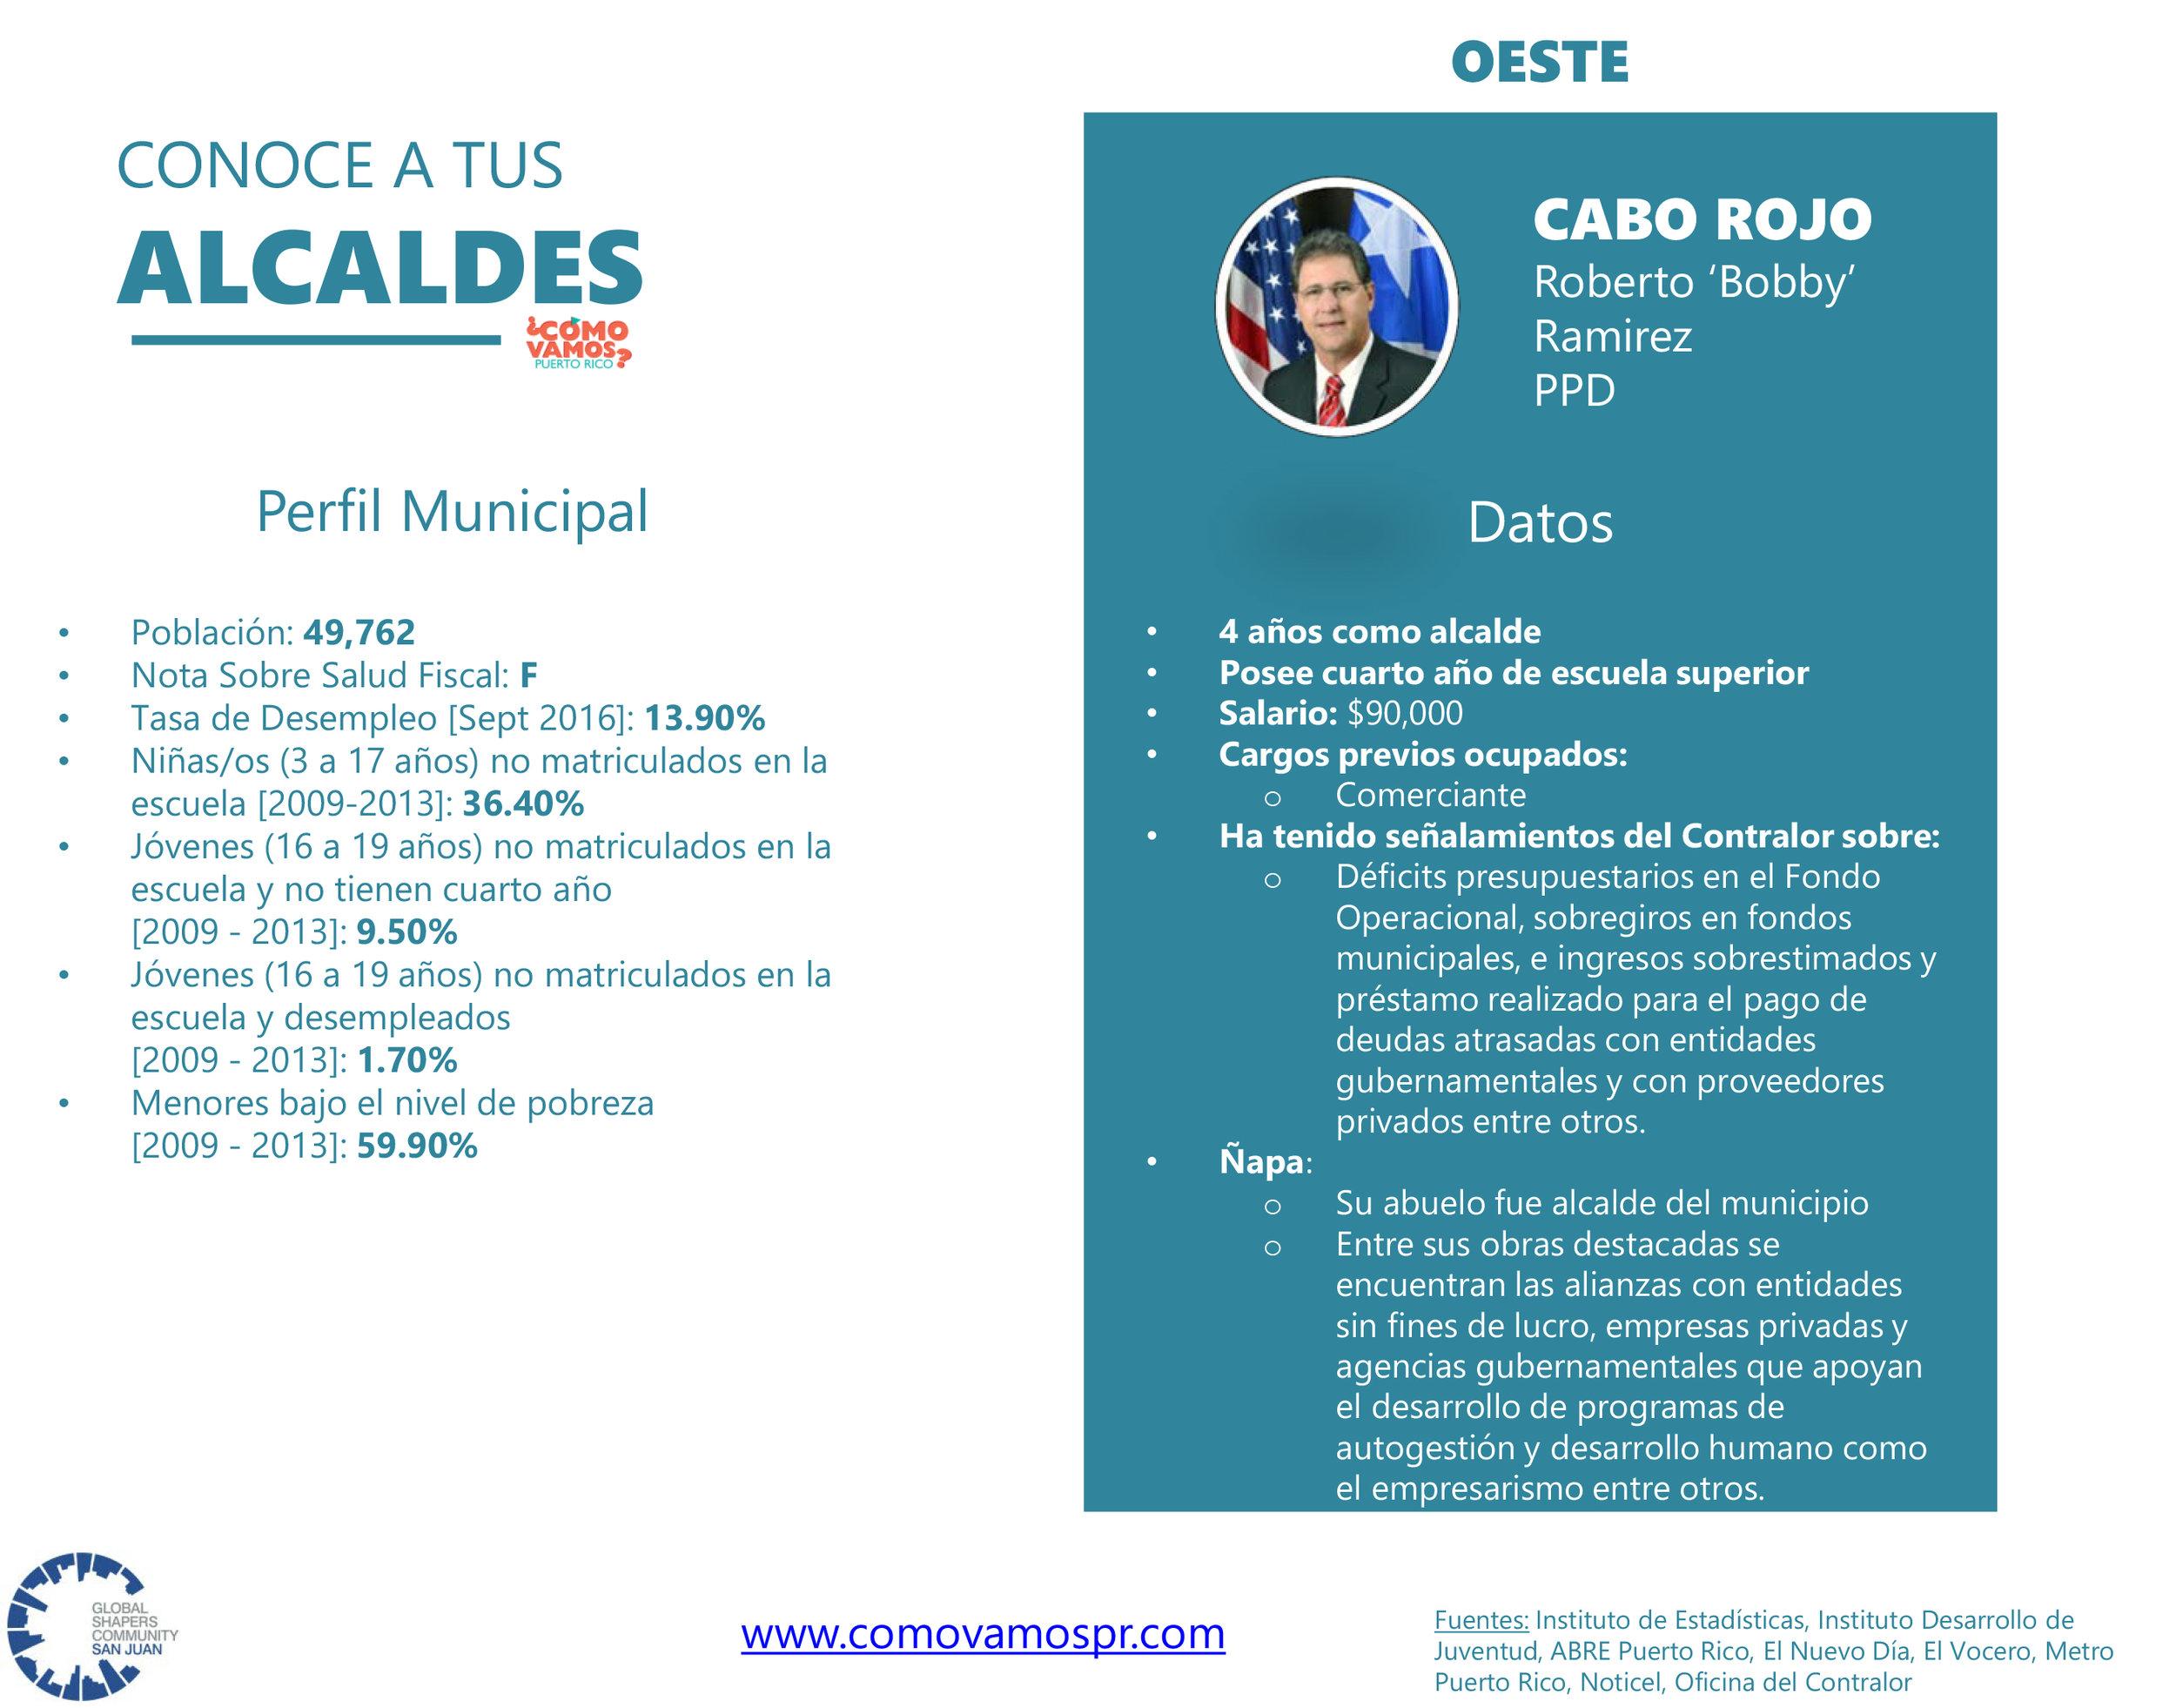 Alcaldes_Oeste_CaboRojo.jpg